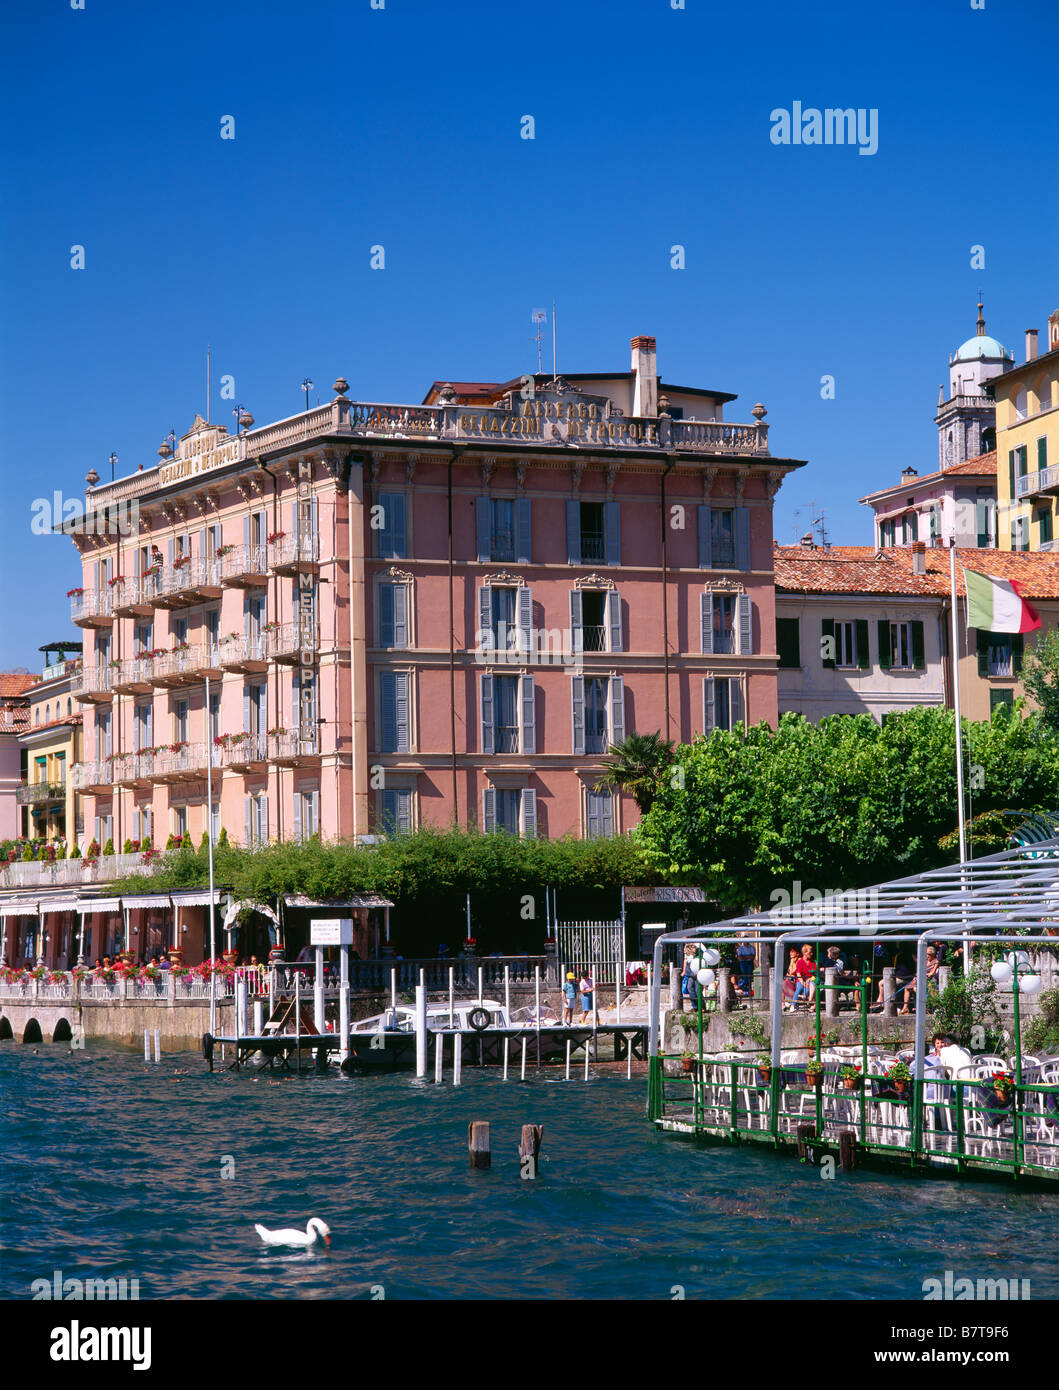 Das Hotel Metropole, Bellagio, Lombardei, Italien. Stockbild